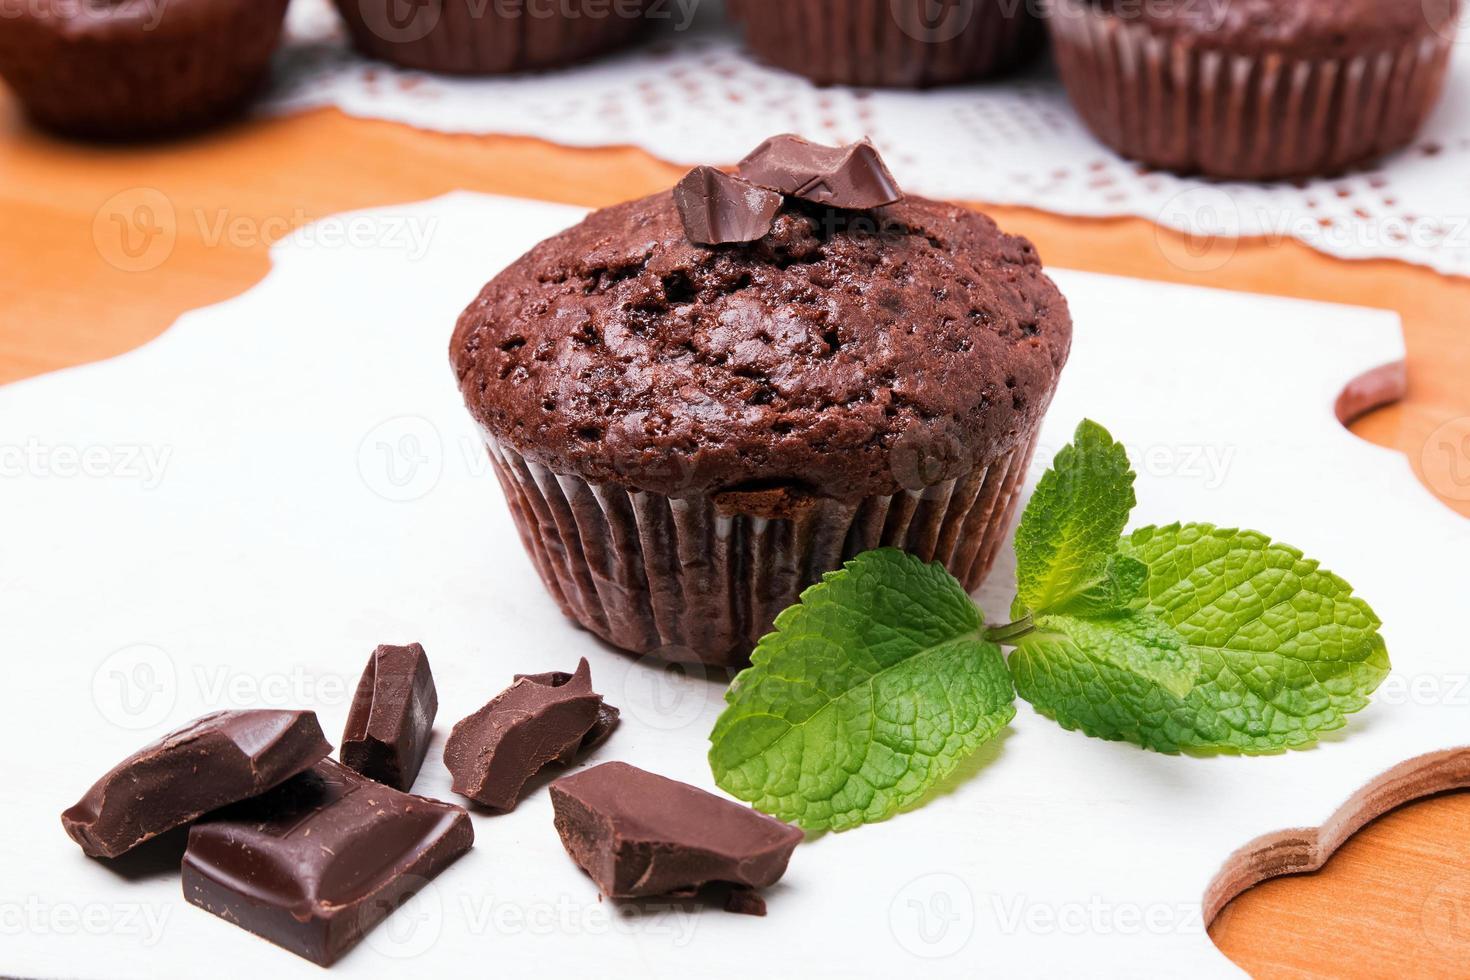 Chocolate muffin close-up photo